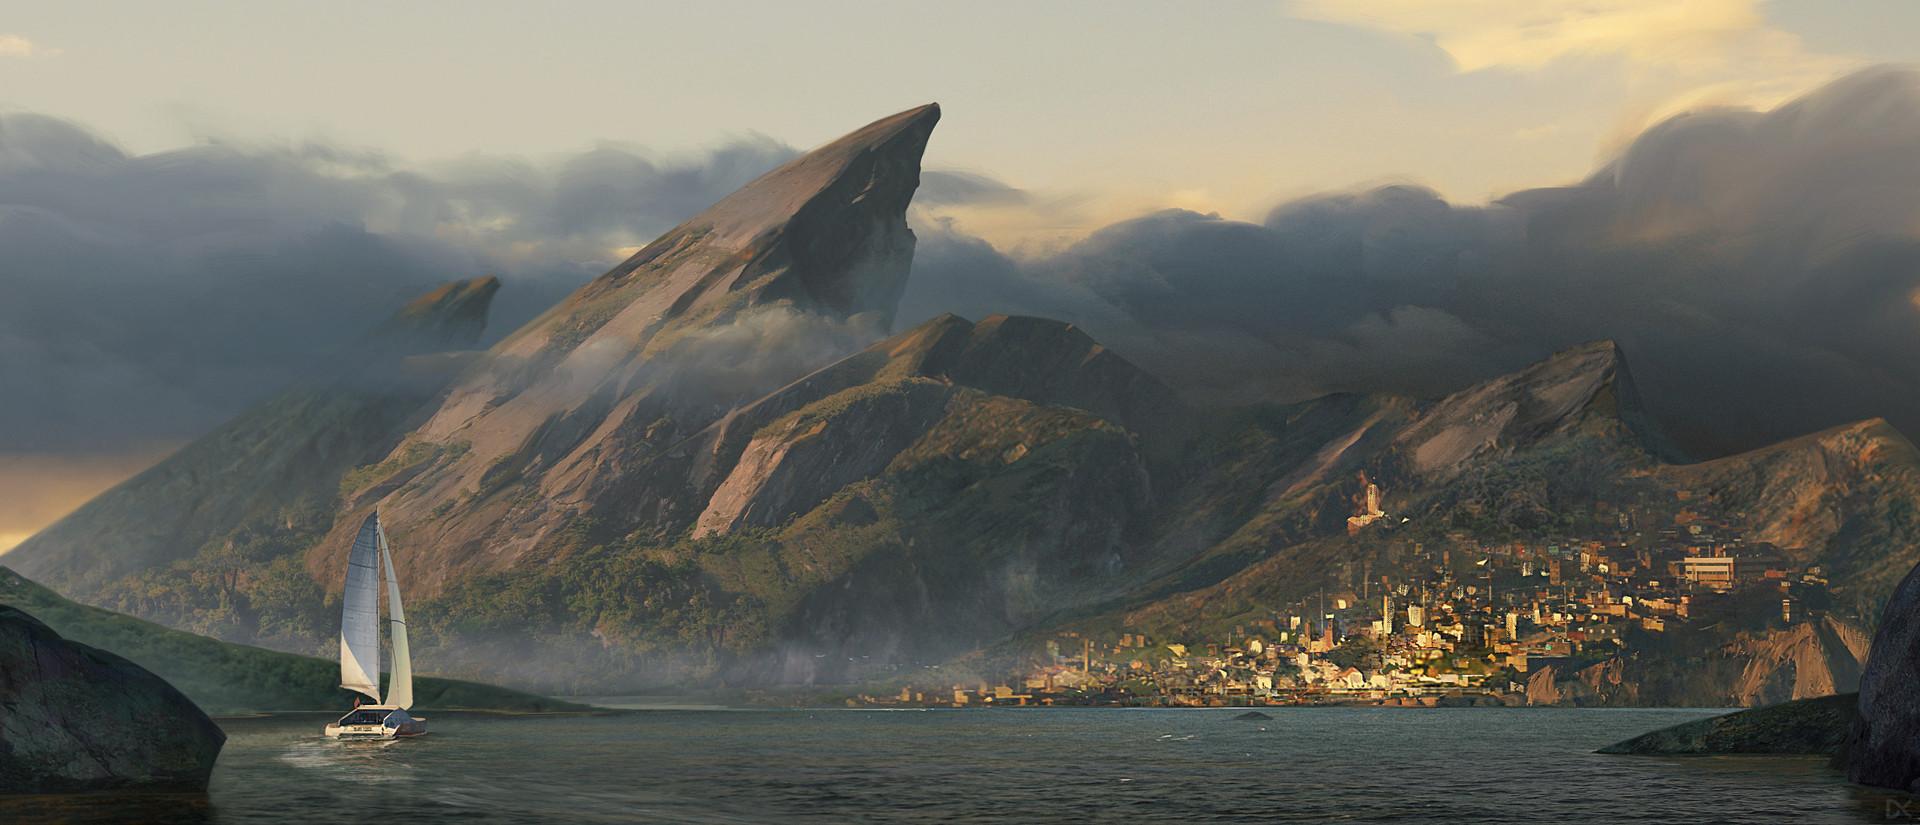 Darius kalinauskas coceptart environment island city boat 4k